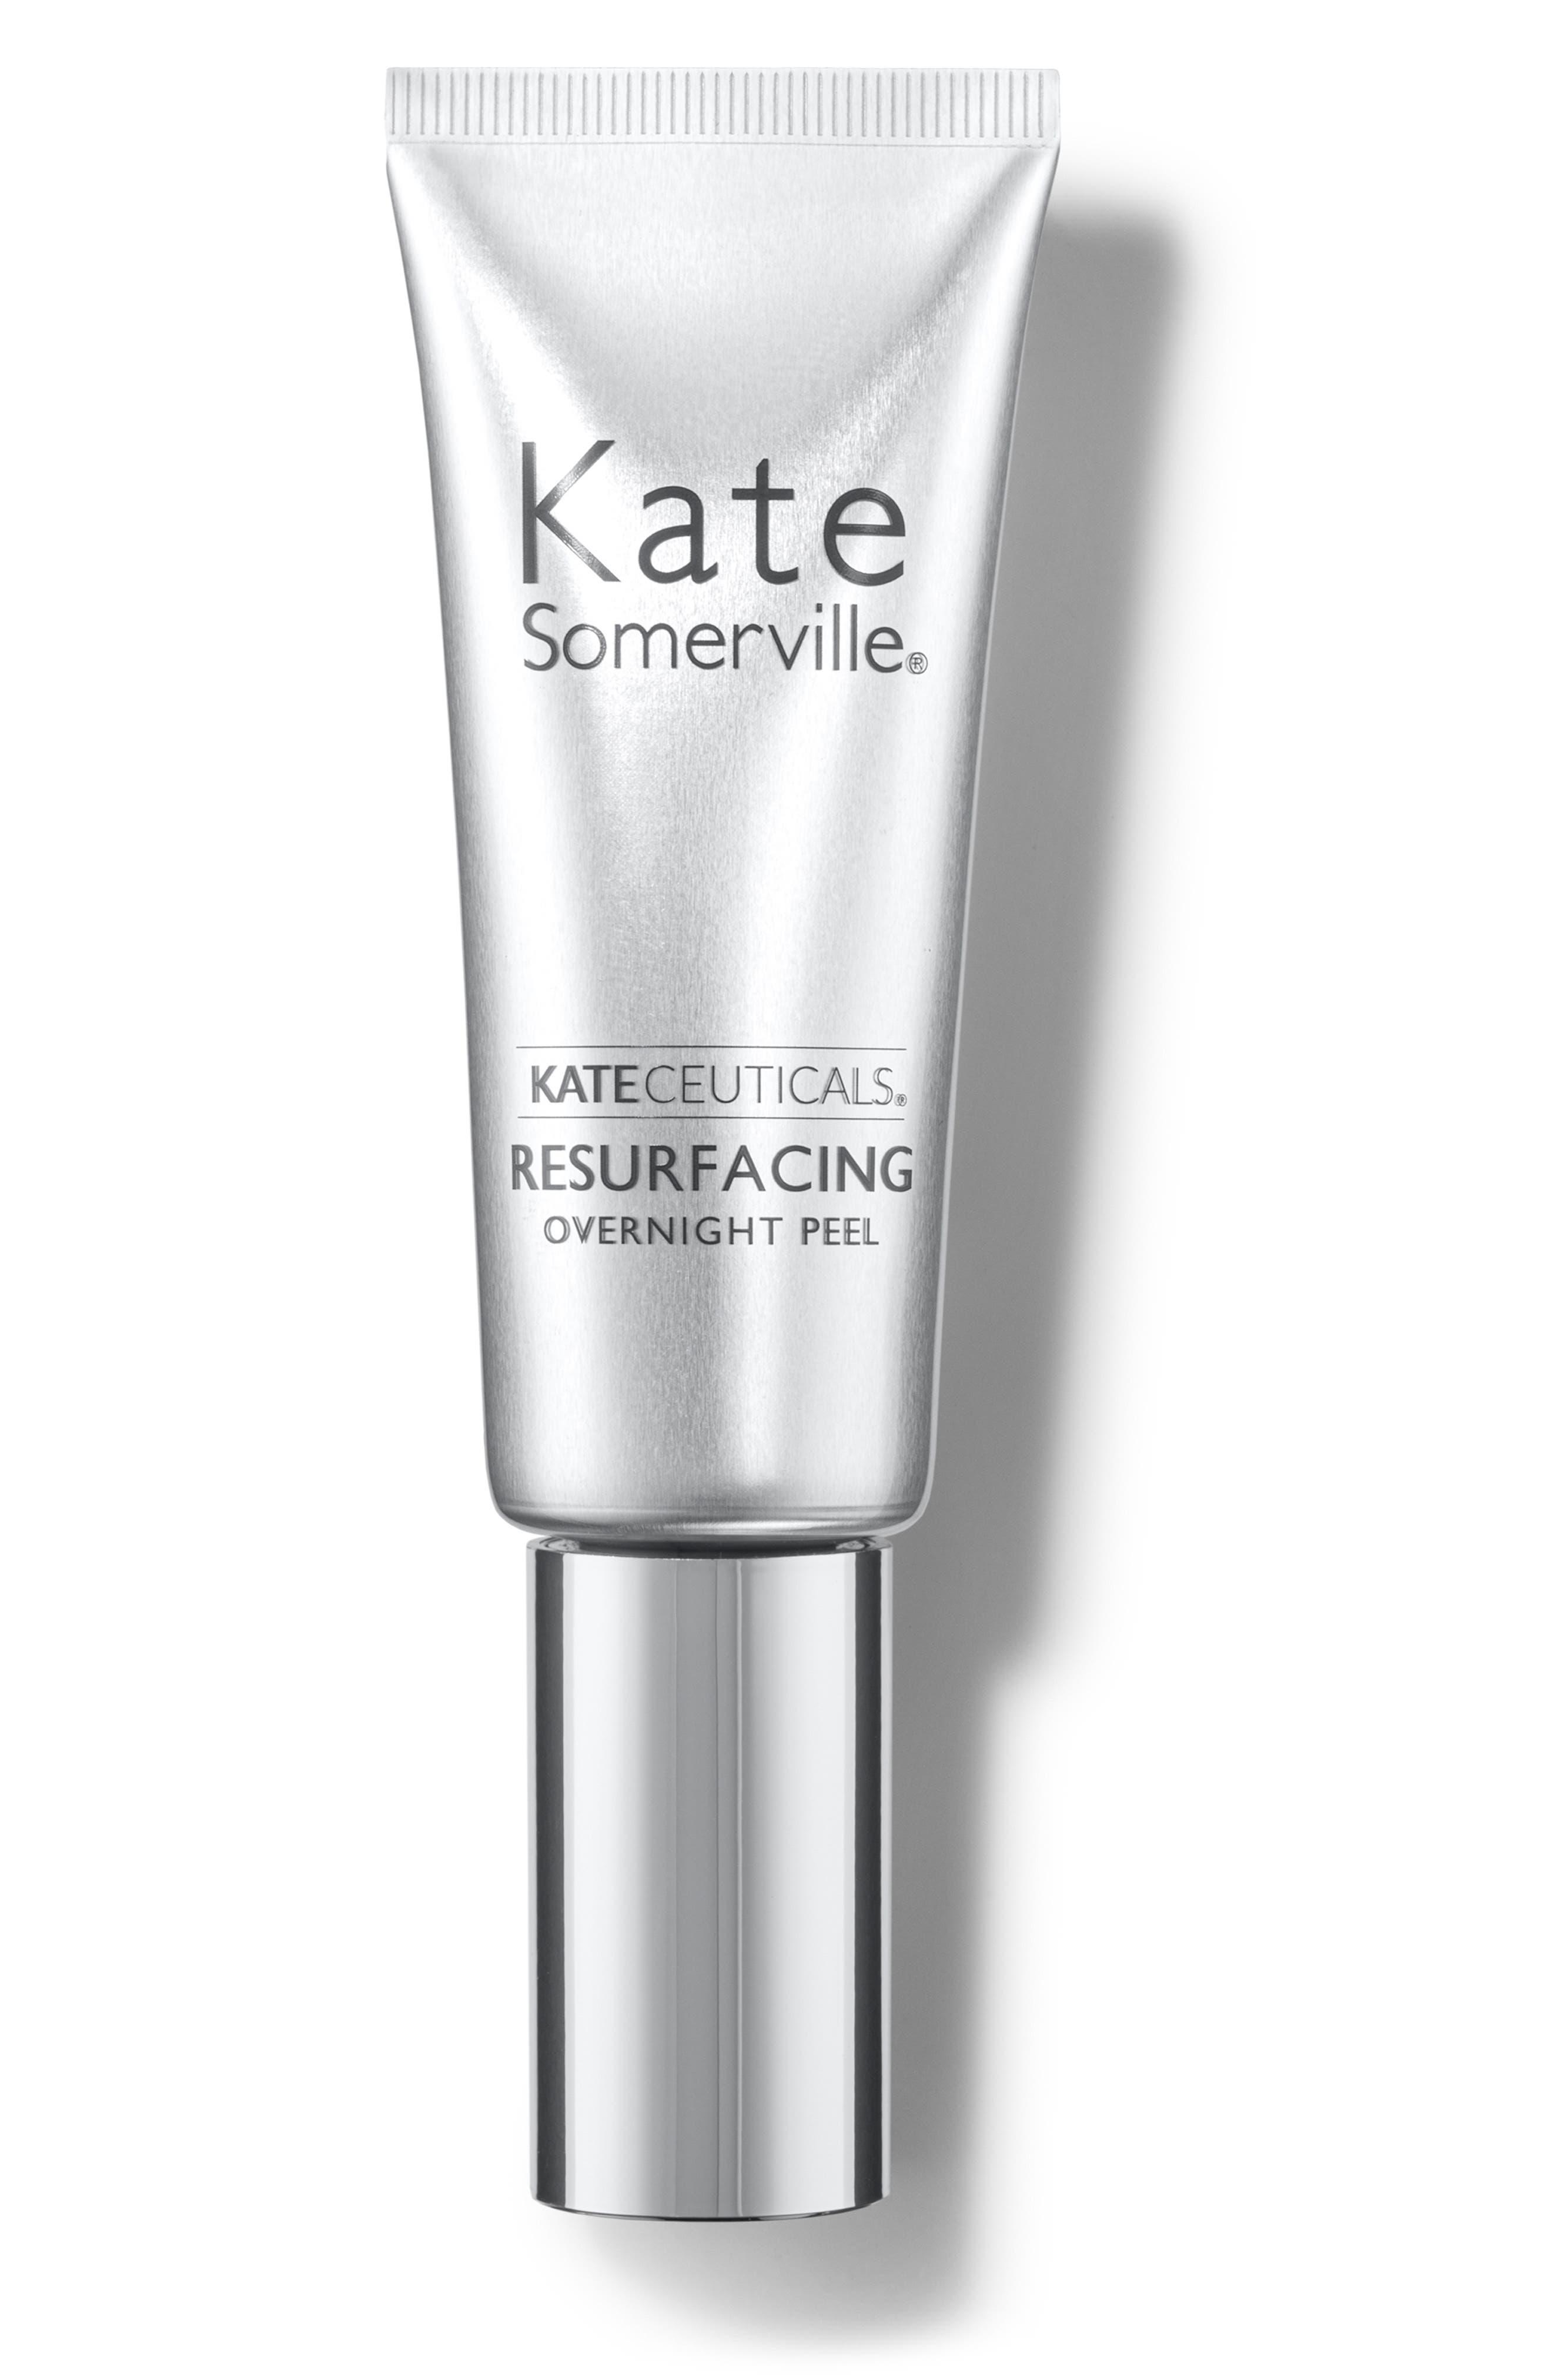 Kate Somerville Kateceuticals Resurfacing Overnight Peel